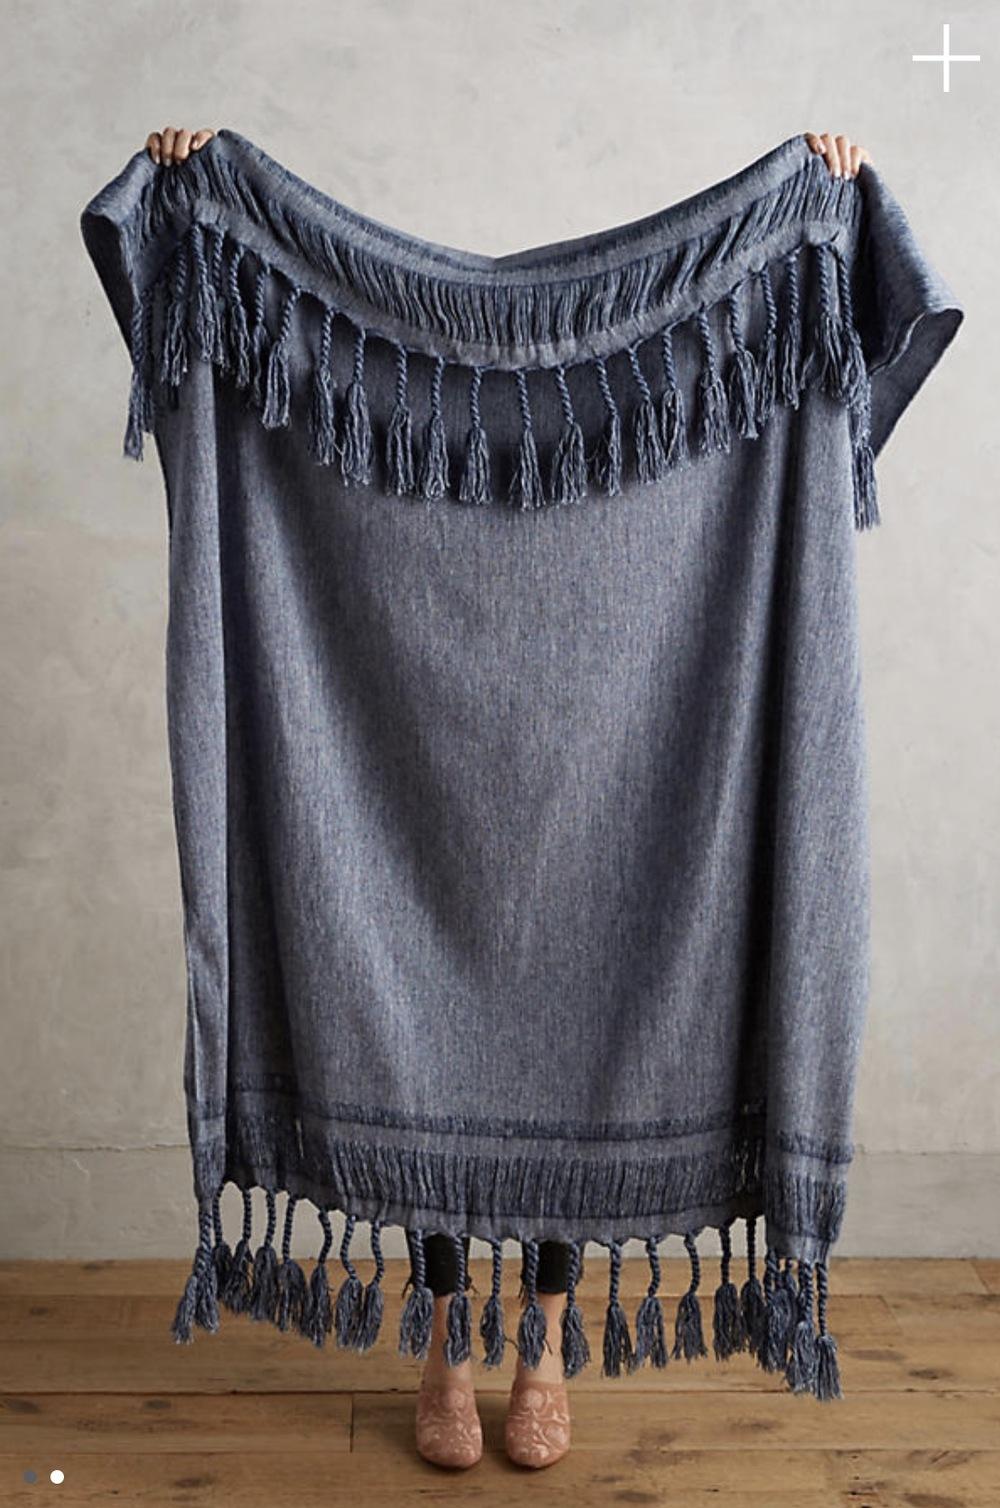 Fringed Rope Throw Blanket